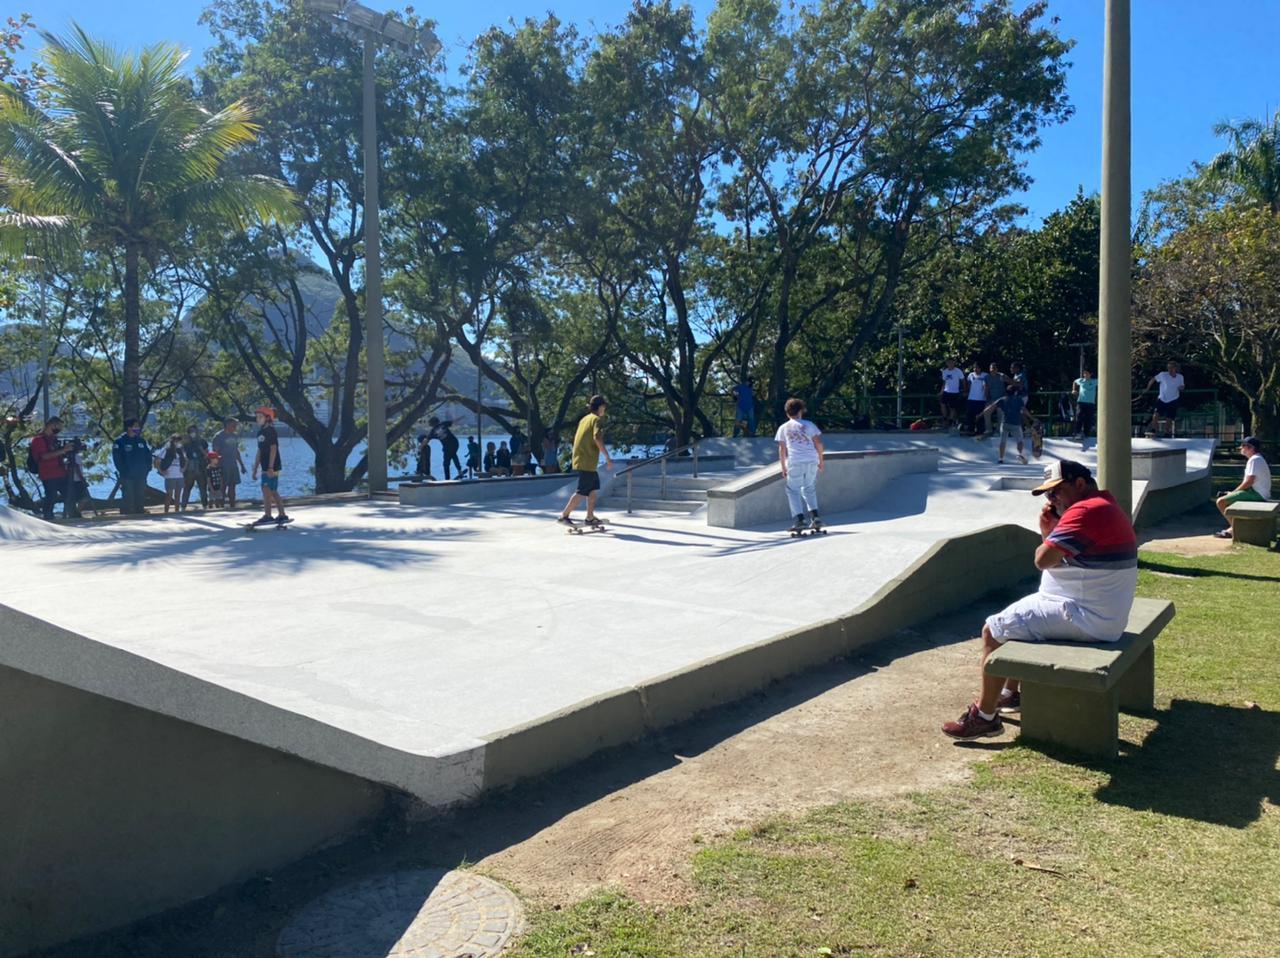 Prefeitura do Rio revitaliza pistas de skate na Lagoa